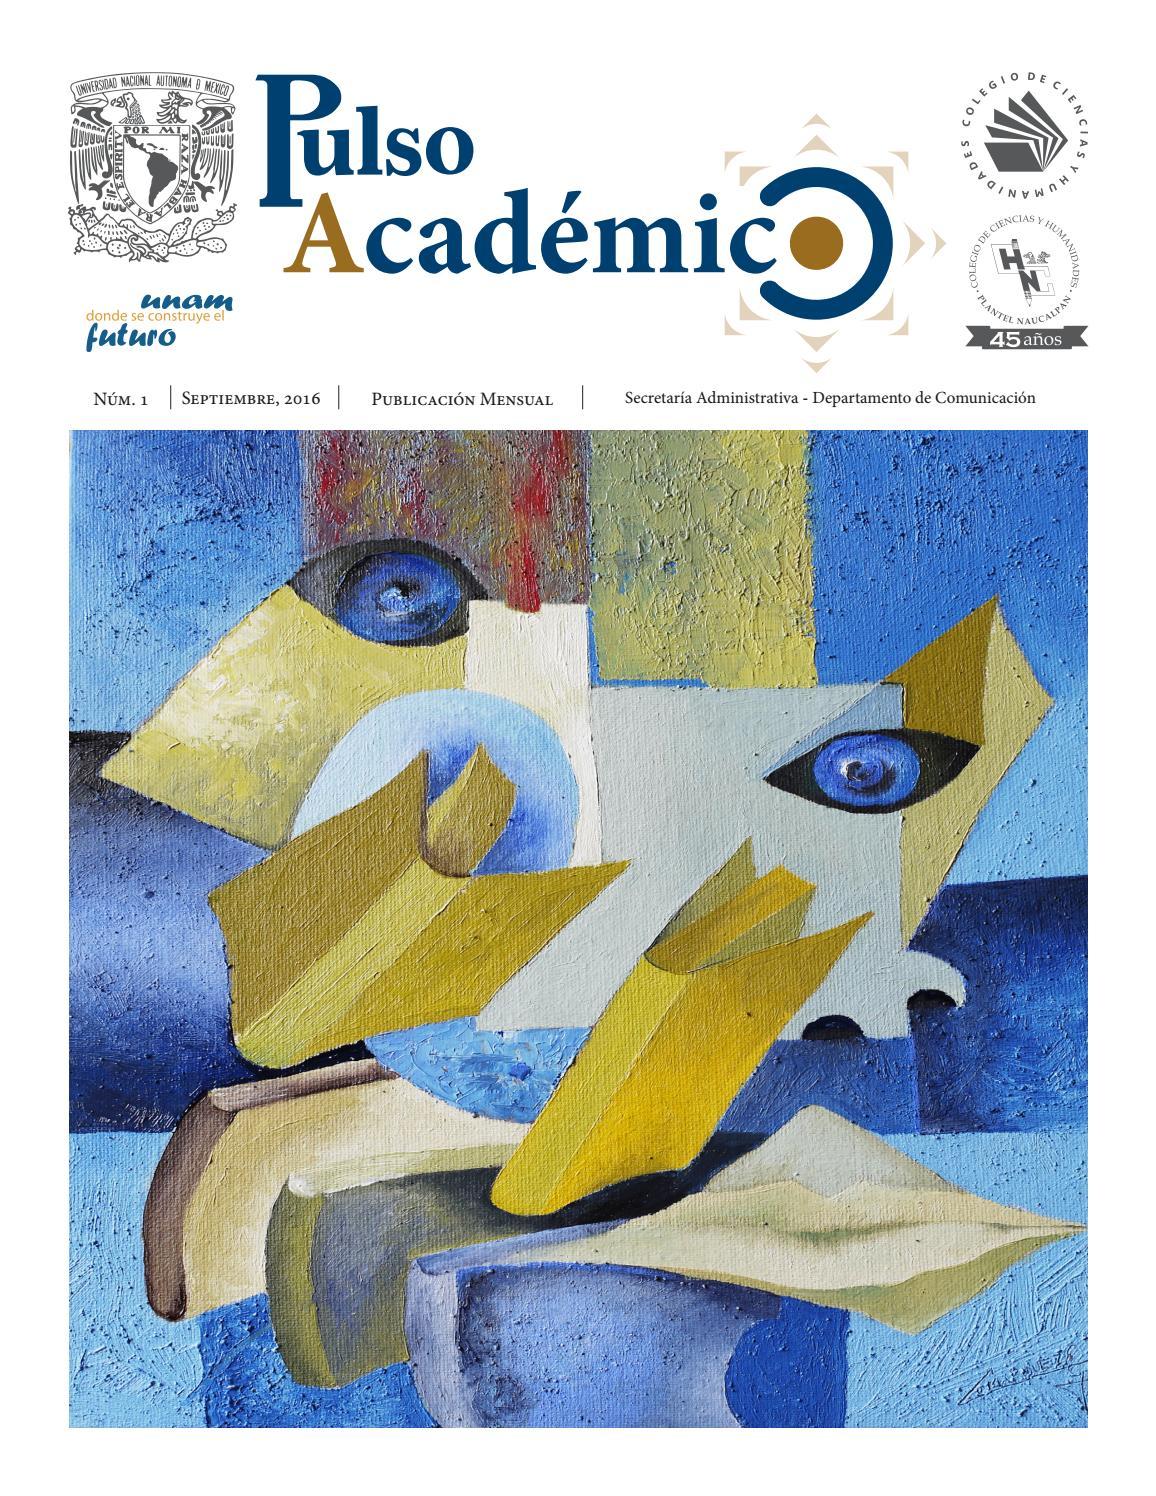 98168a54323 Pulso Académico Nº 7 by Pulso Académico - issuu